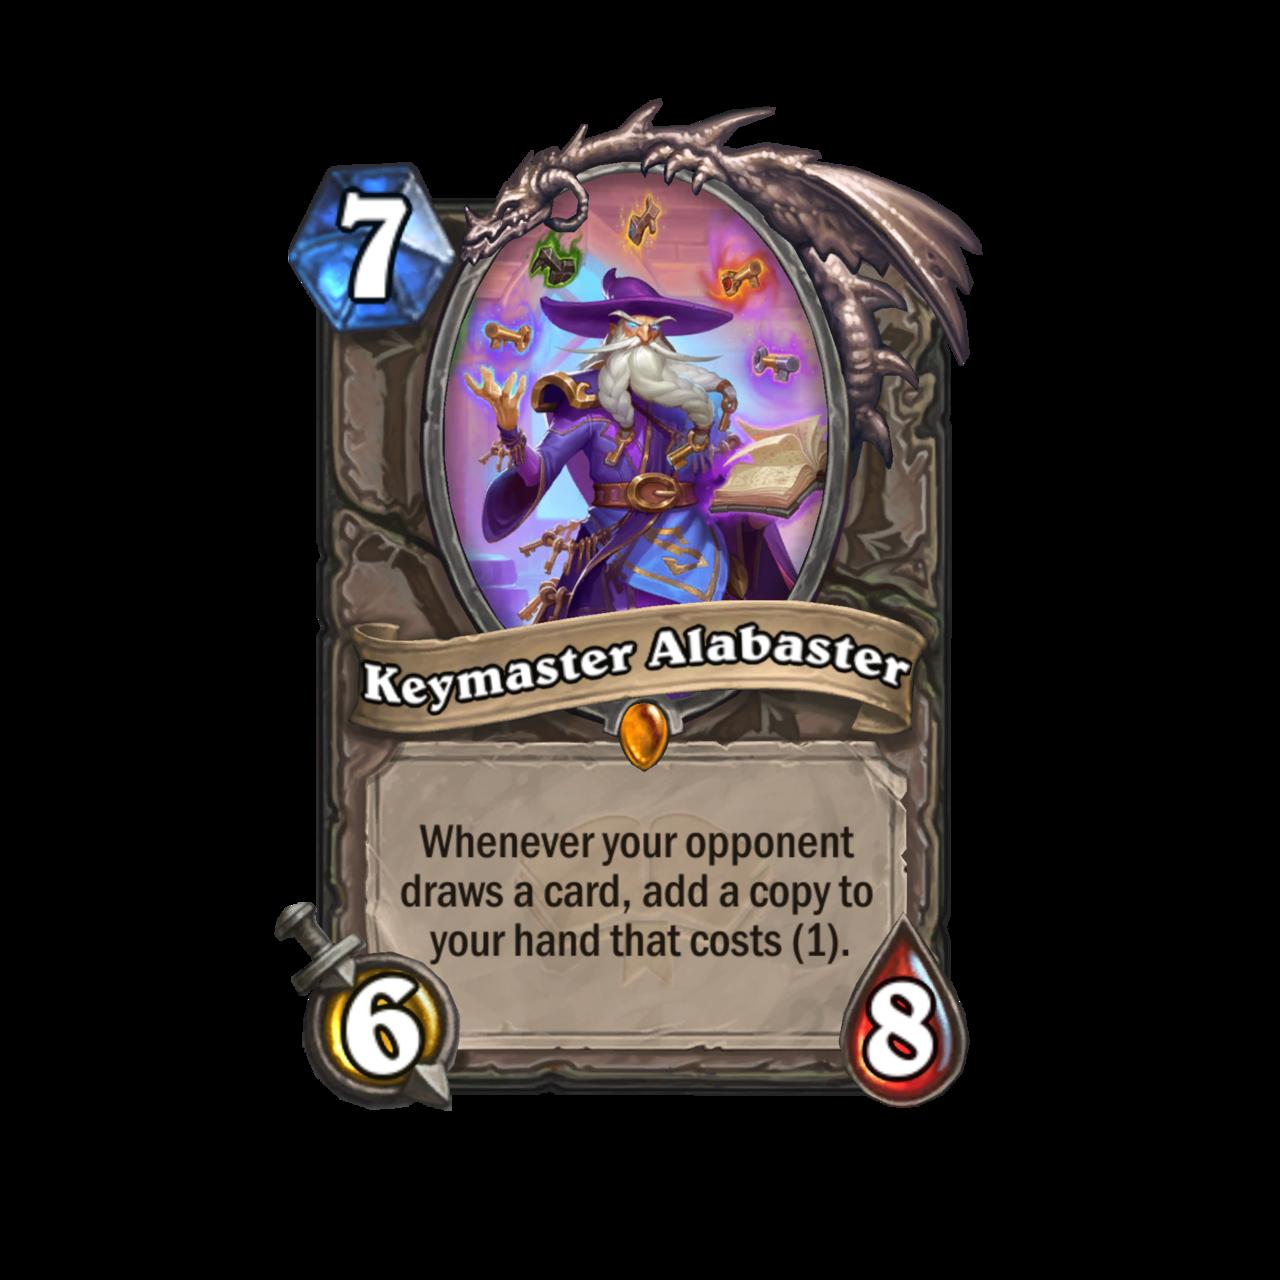 Keymaster Alabaster - Neutral Legendary for Hearthstone: Scholomance Academy